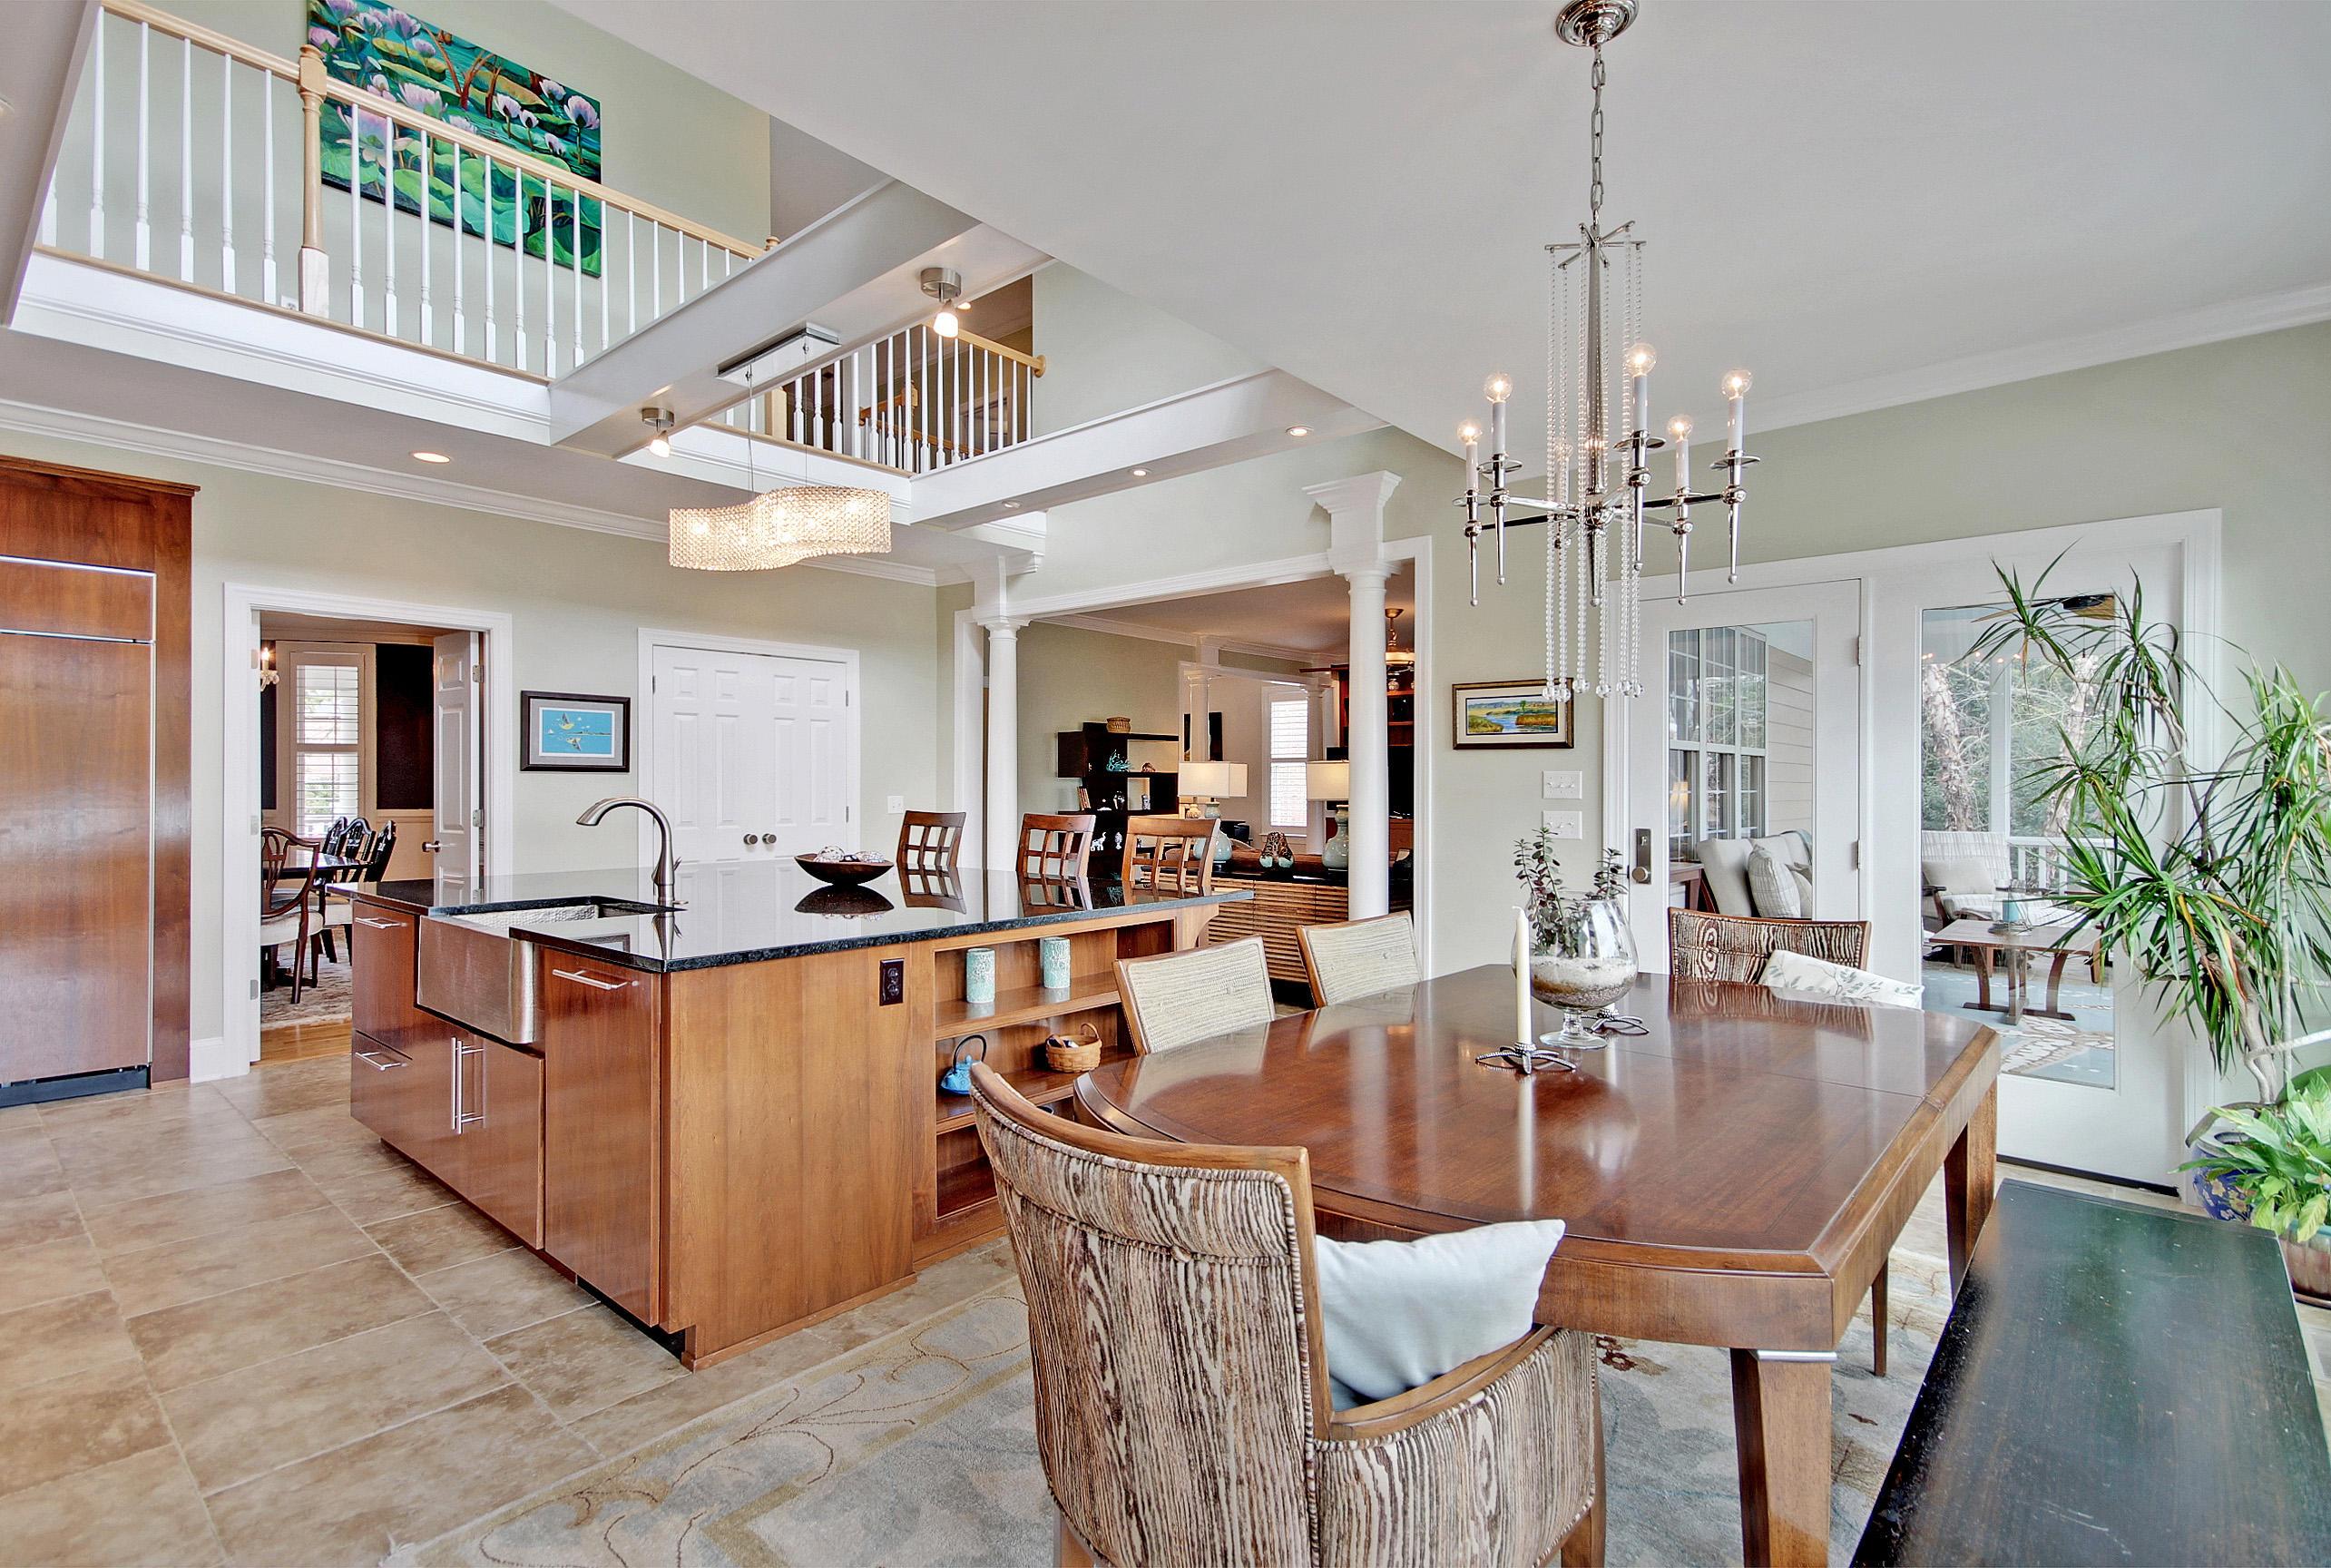 Dunes West Homes For Sale - 2364 Darts Cove, Mount Pleasant, SC - 53